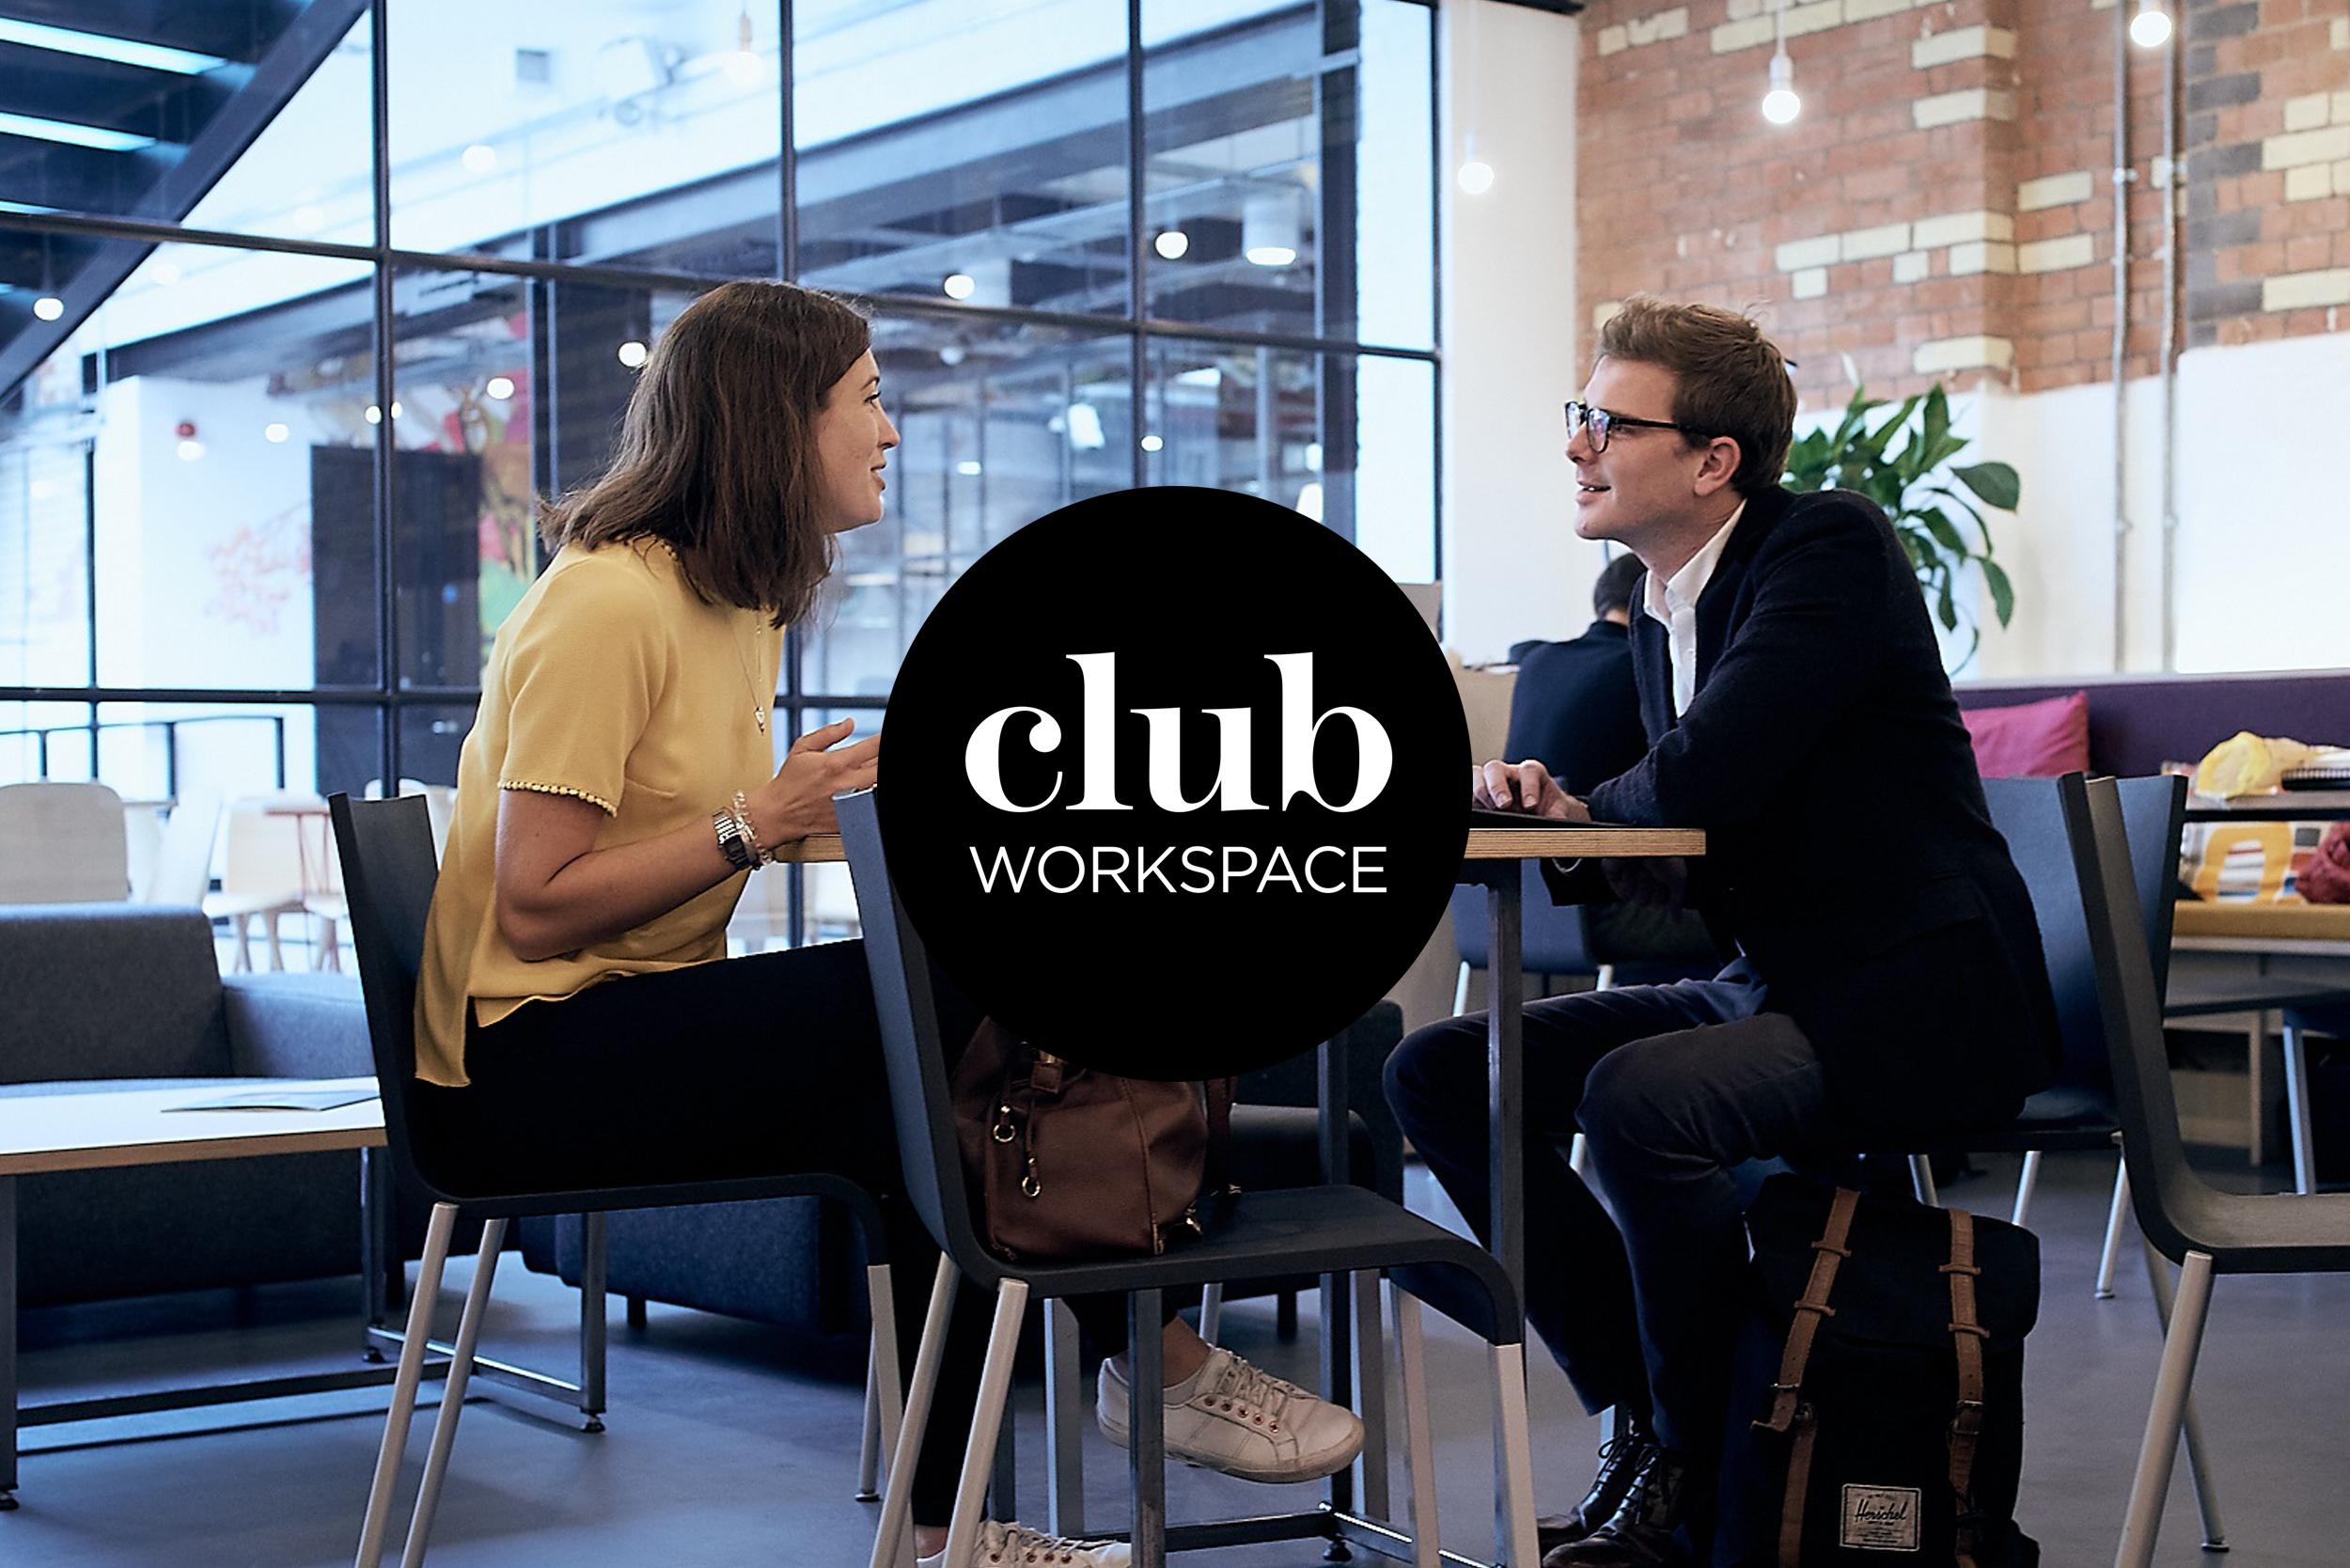 CLUB WORKSPACE IMAGE